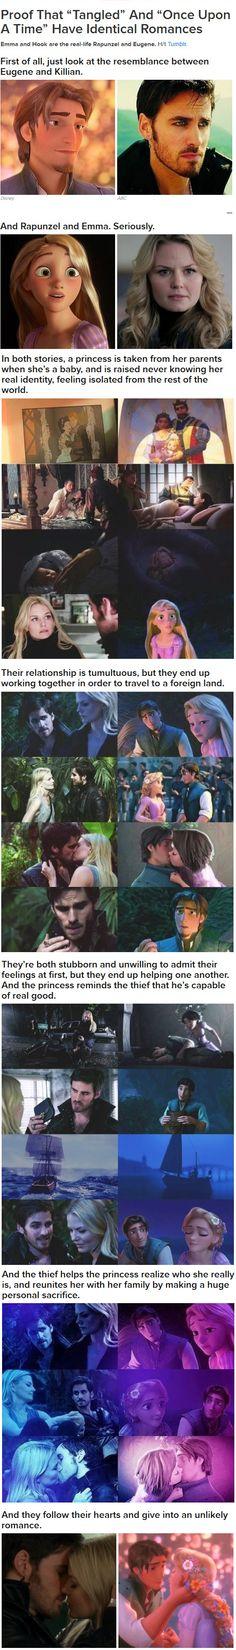 The Emma & Hook and Rapunzel & Flynn parallels